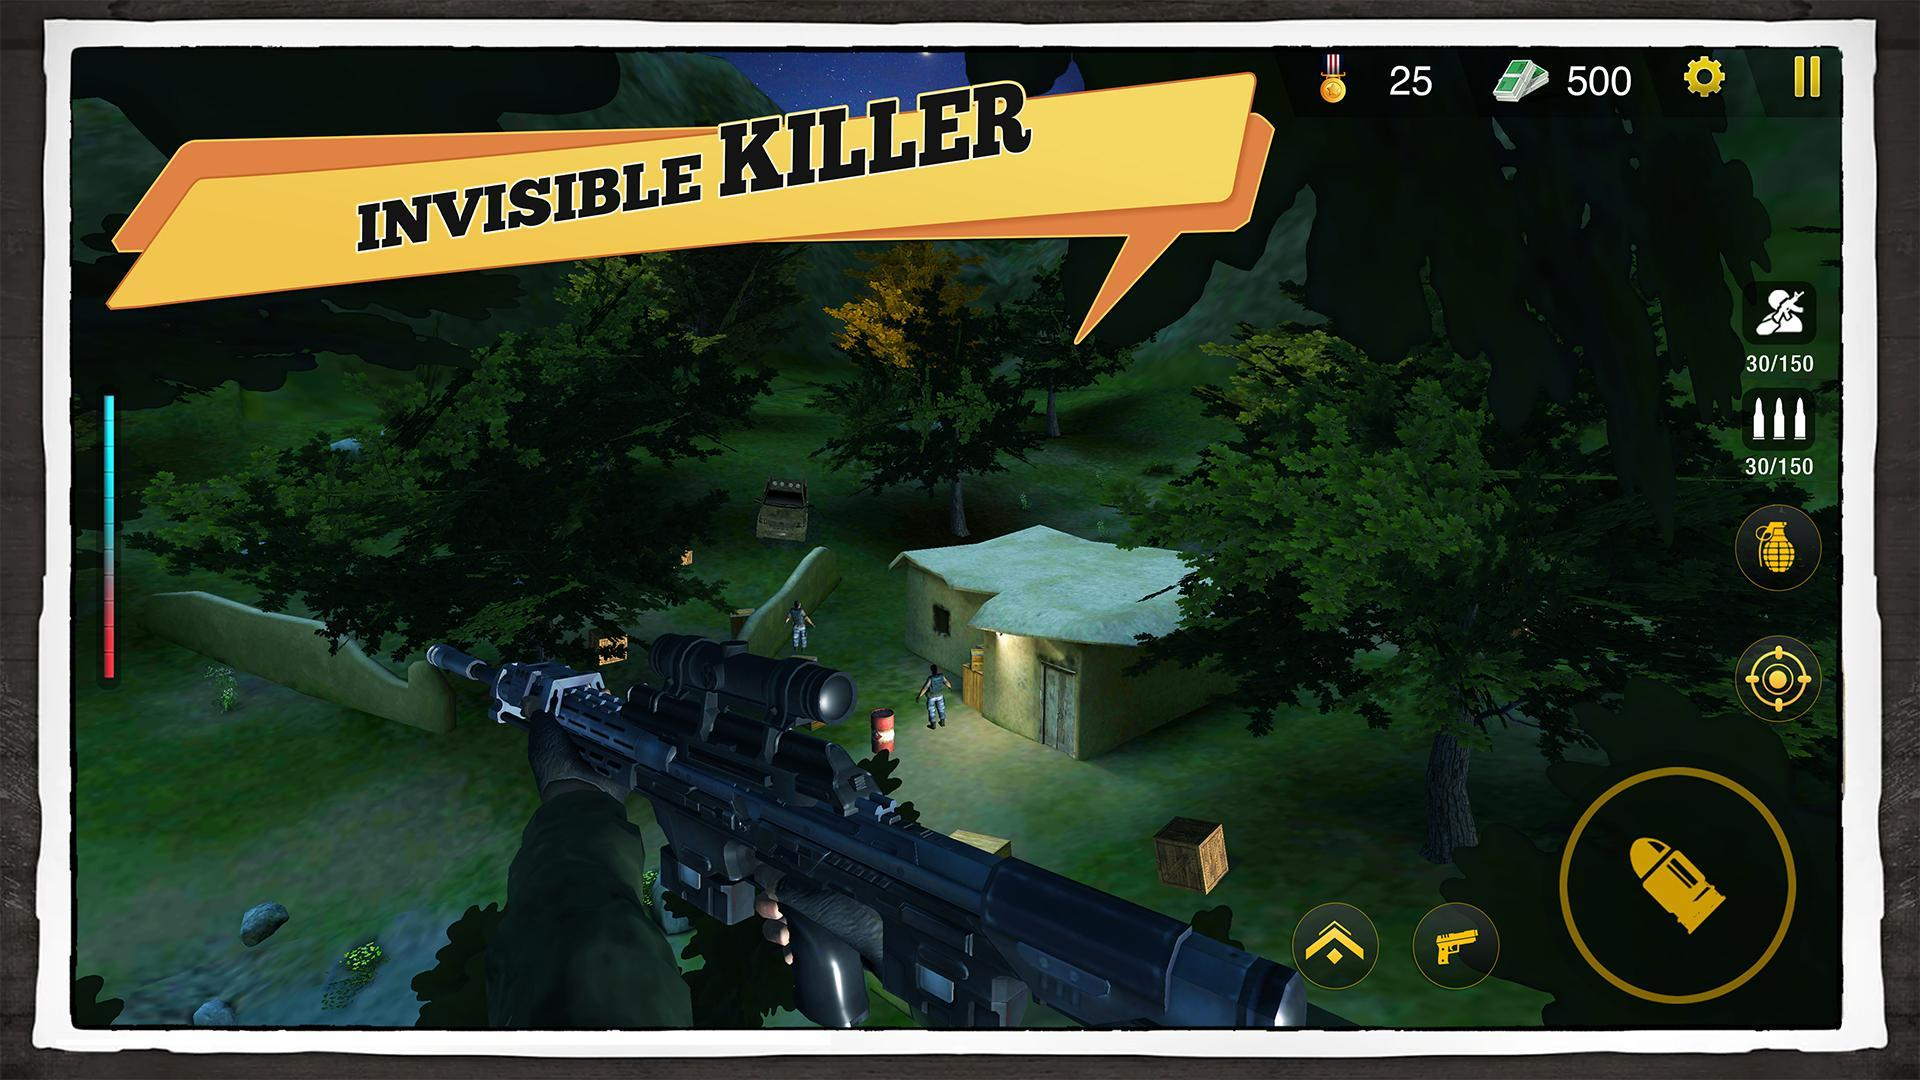 Yalghaar Delta IGI Commando Adventure Mobile Game 3.4 Screenshot 24